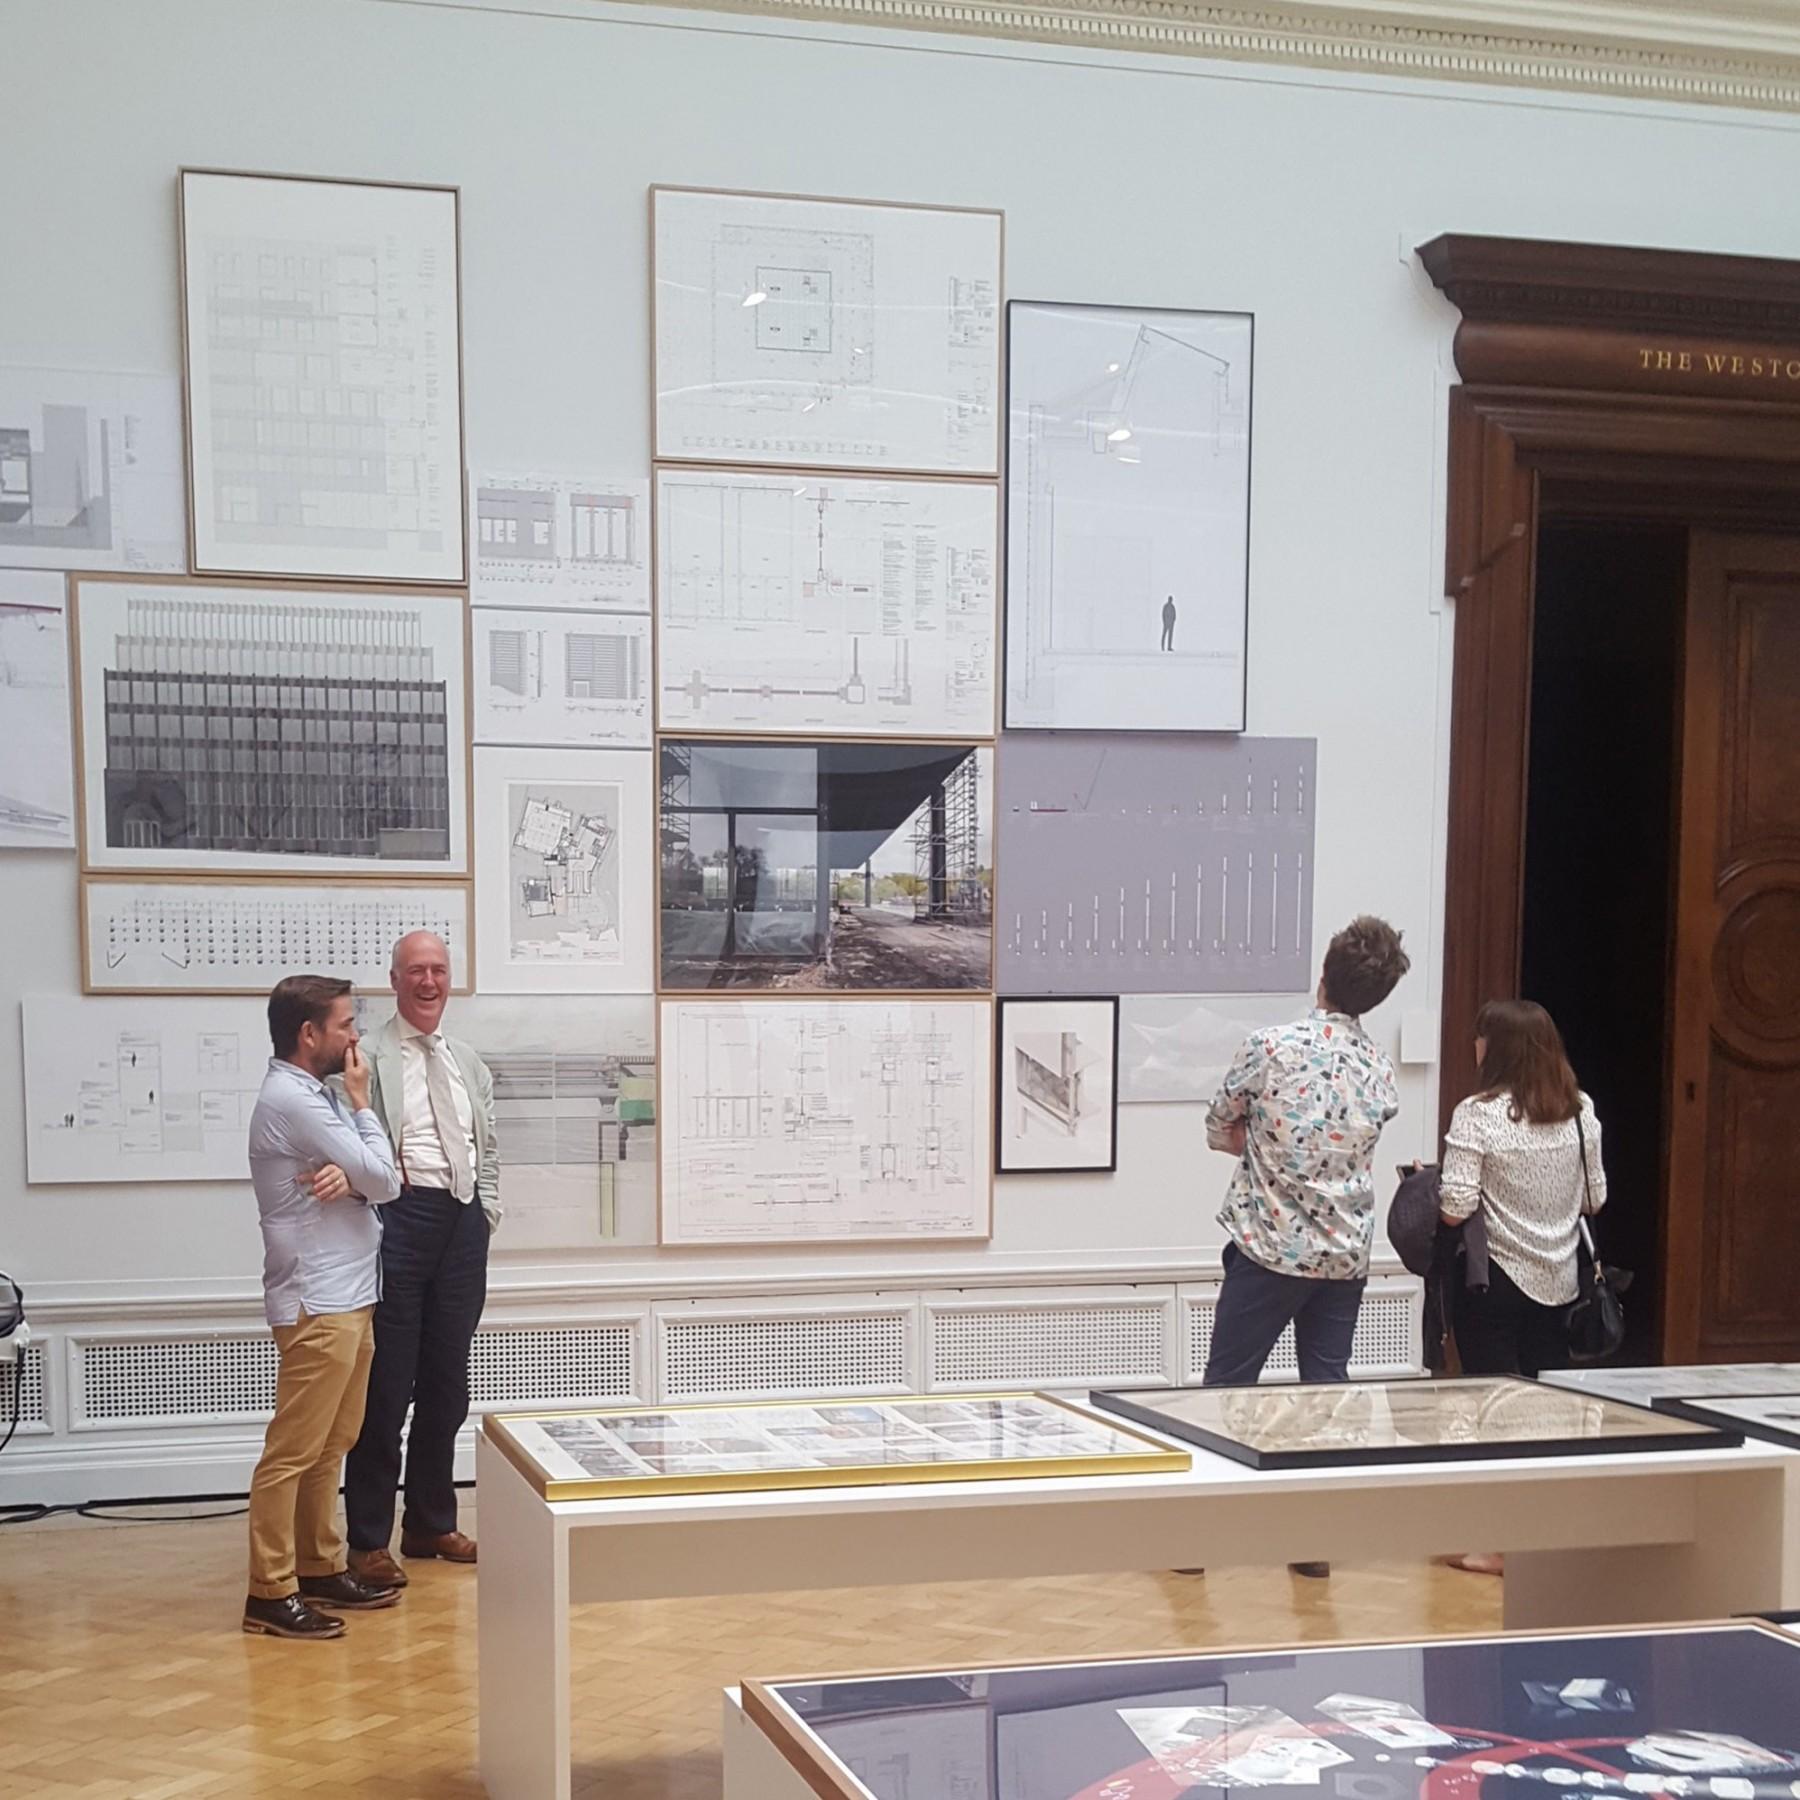 Jamie-fobert-architects-Royal-academy-summer-show-farshid-moussavi-architecture